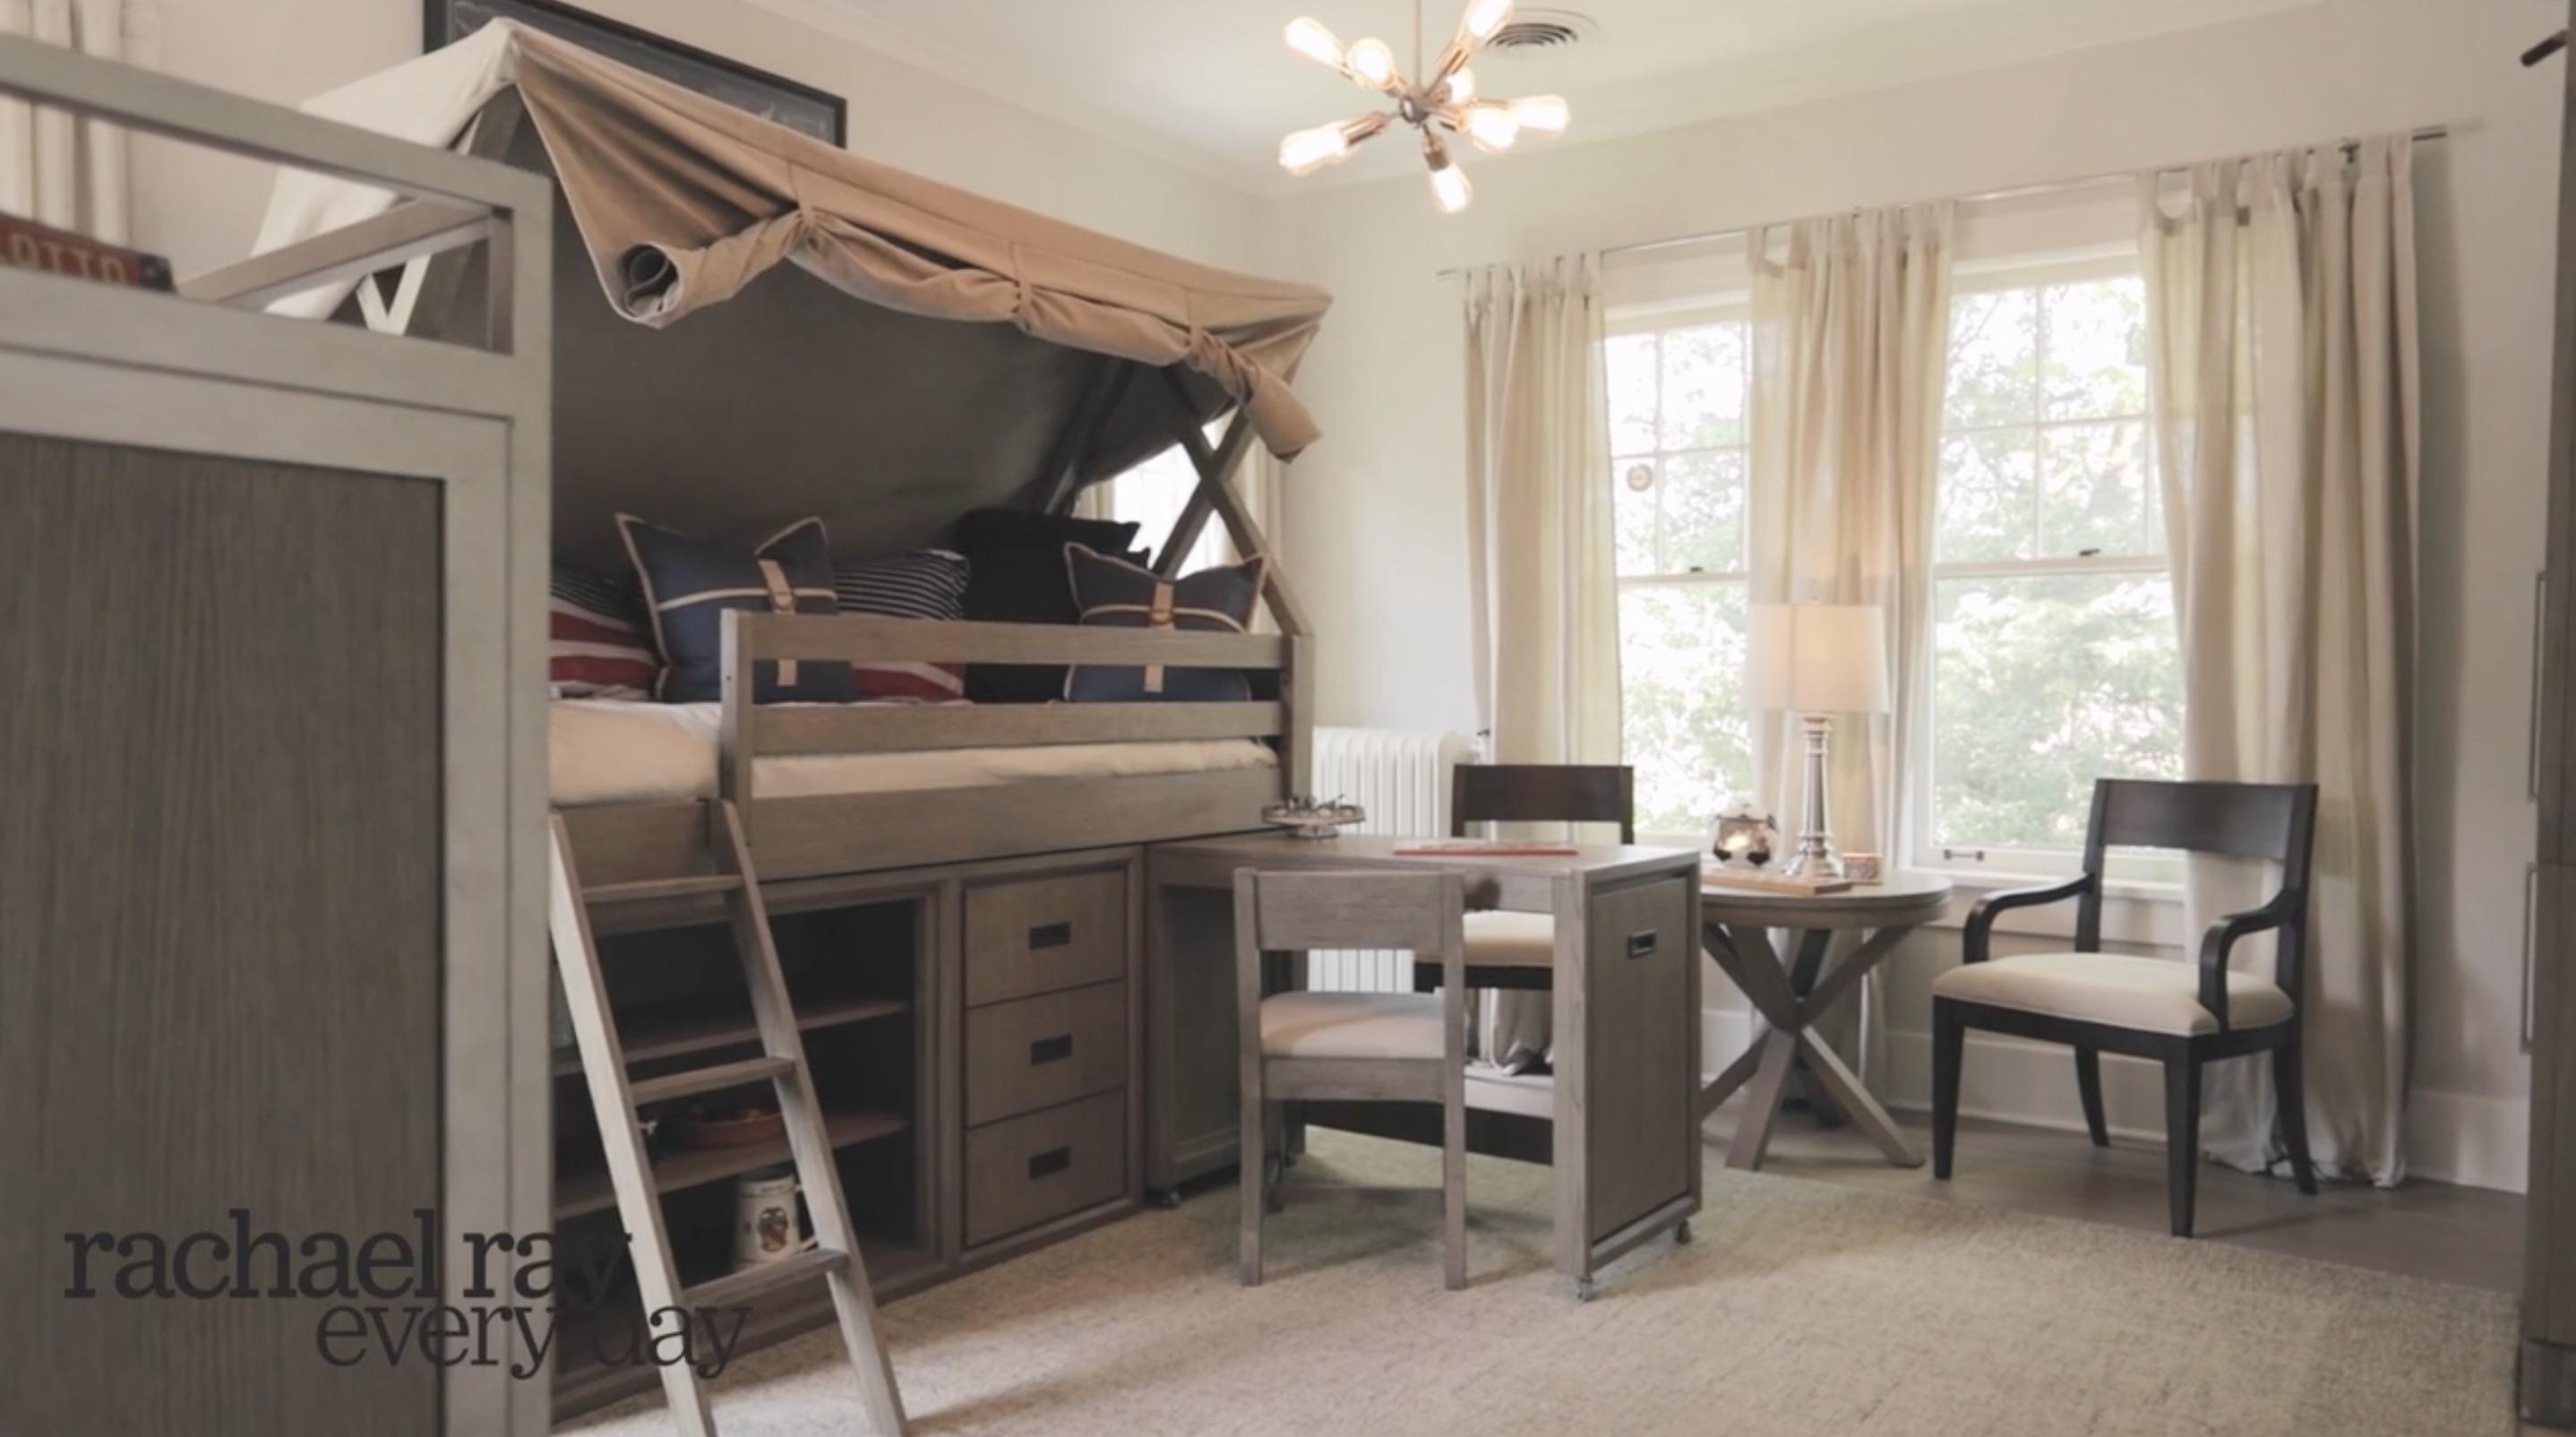 Rachael-ray-home-kids-bedroom